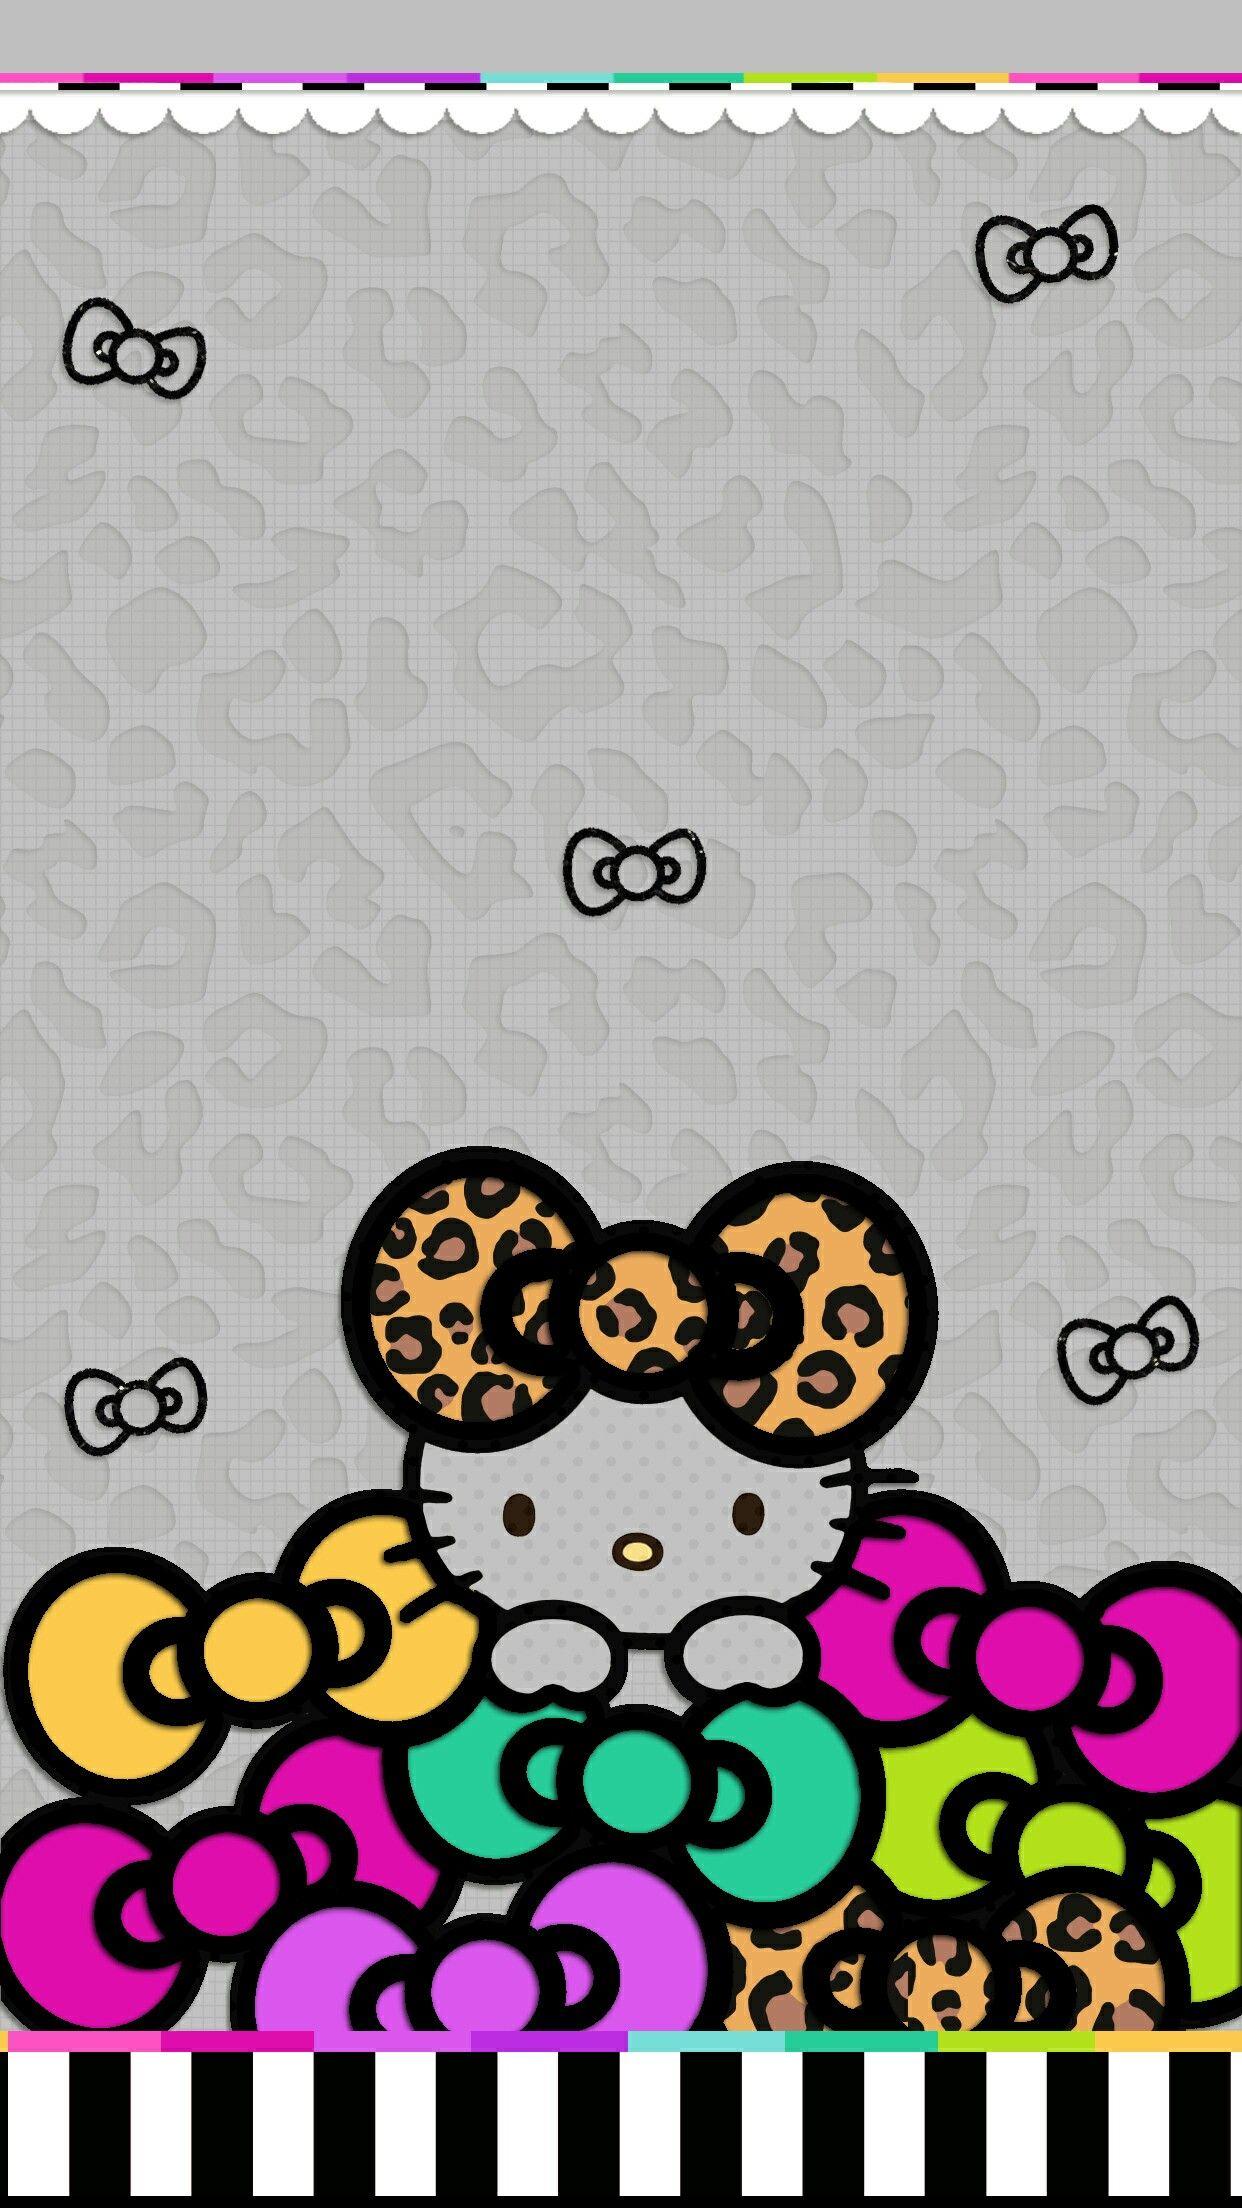 Download Wallpaper Hello Kitty Gray - cd82ea08fb71d4265a28c41b3108364b  Collection_475858.jpg